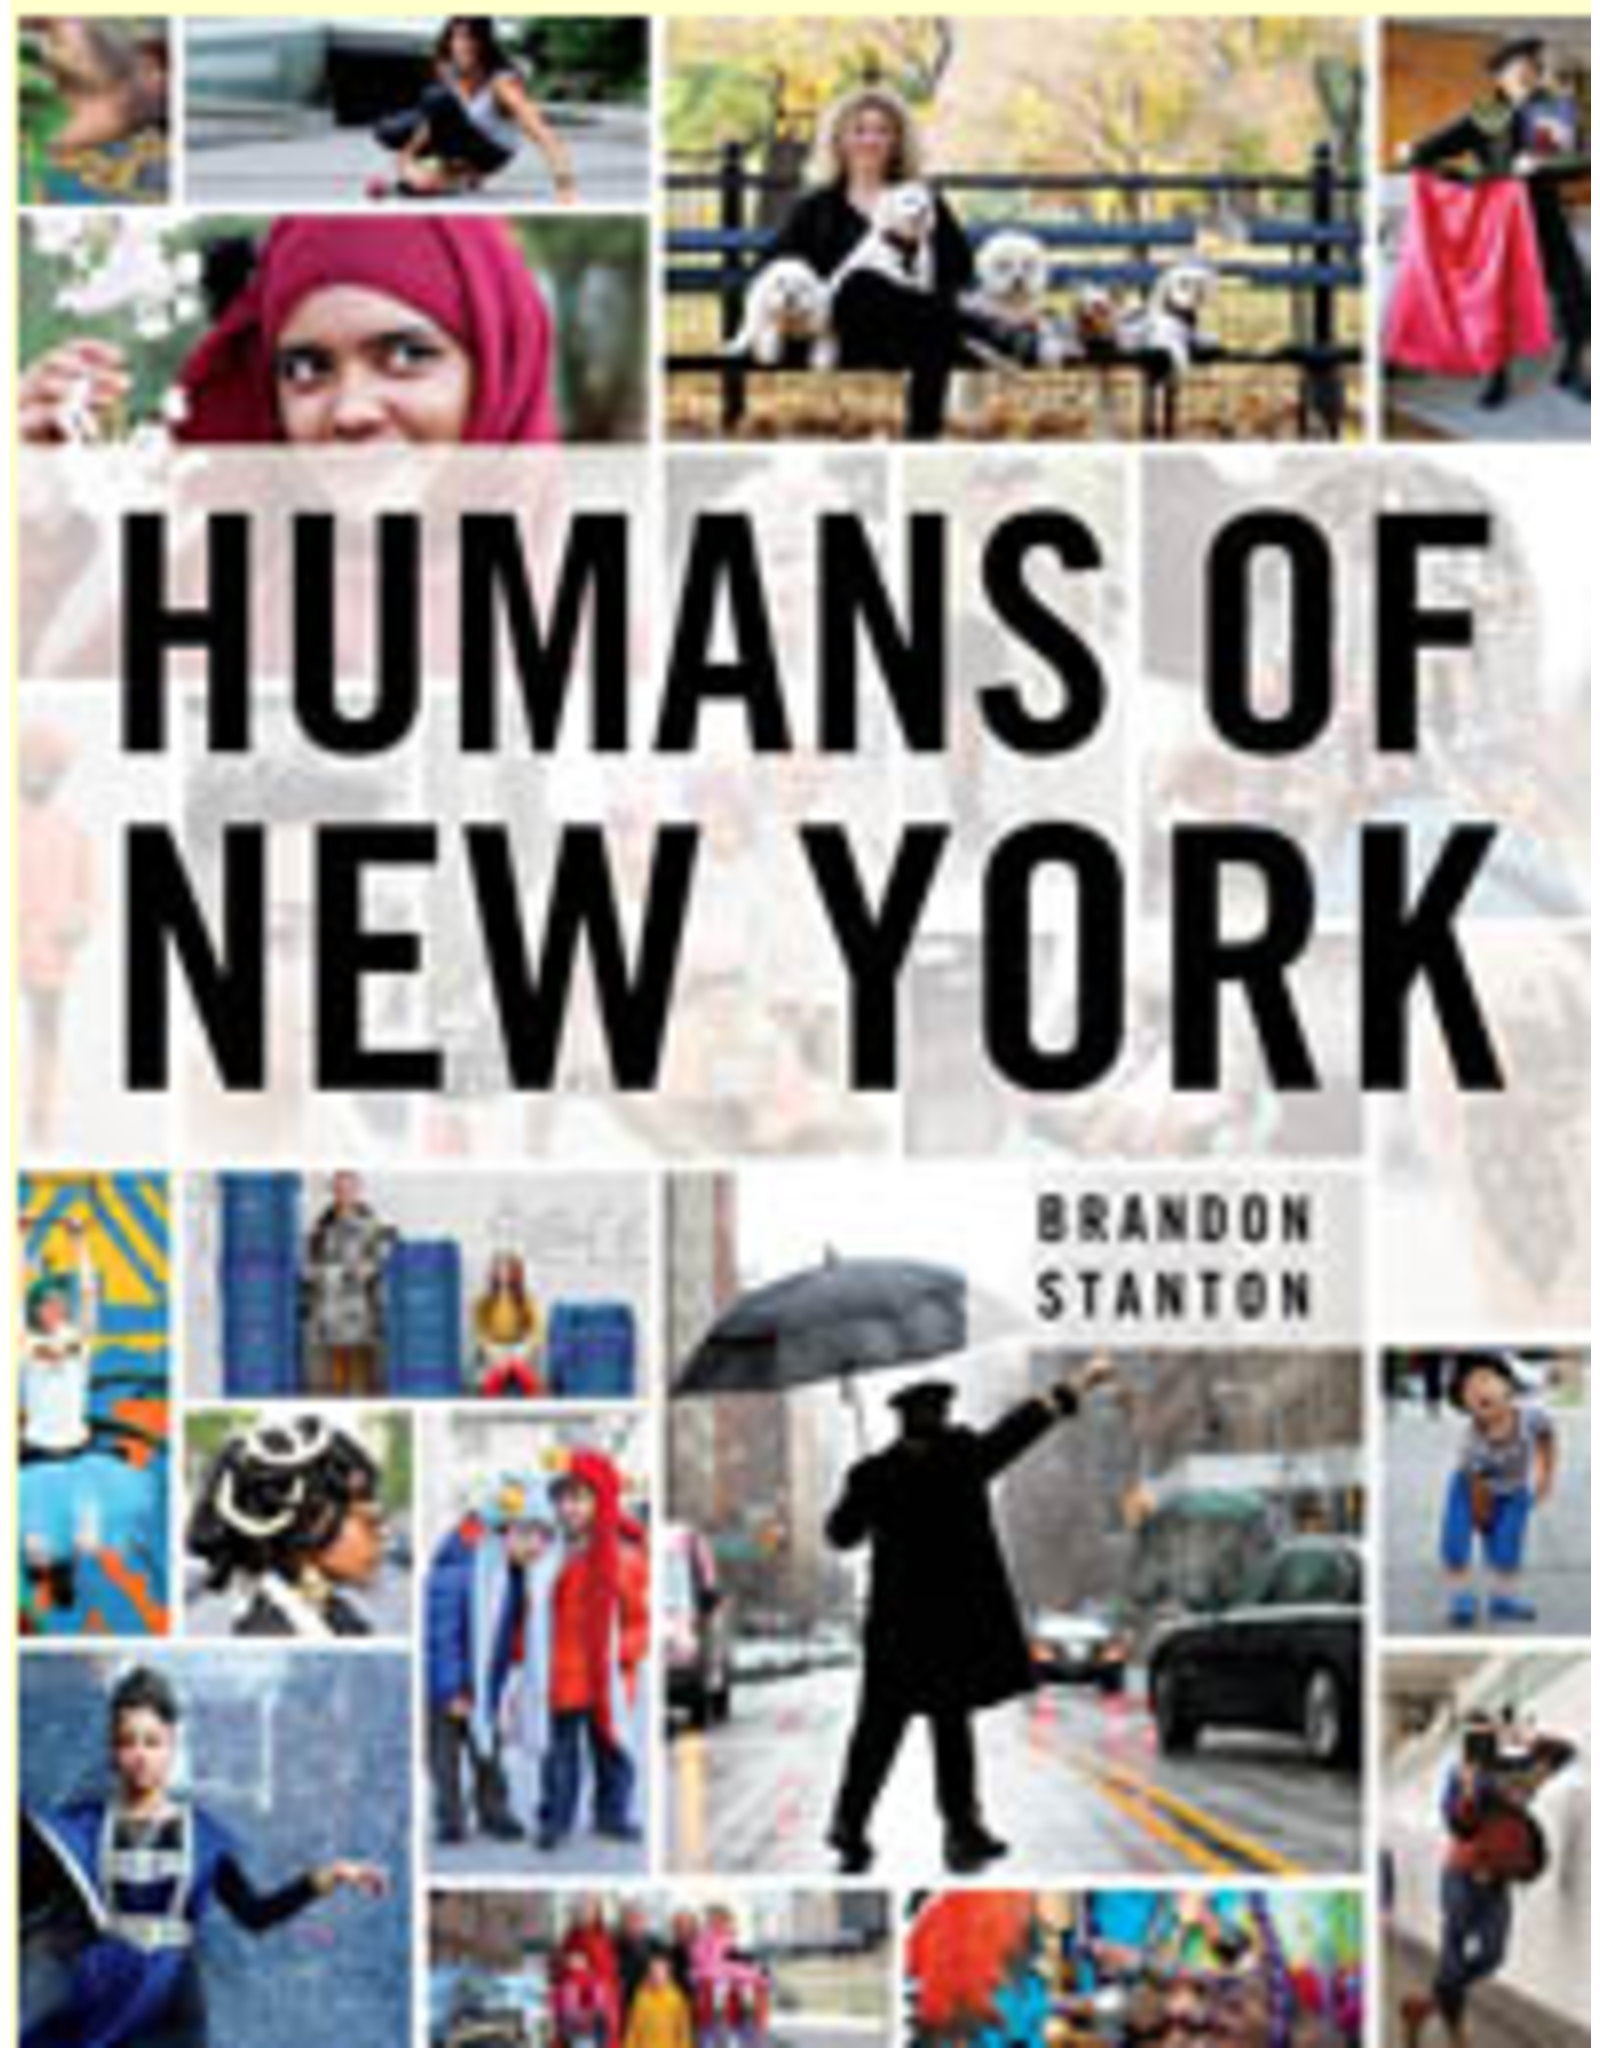 Website Humans of New York